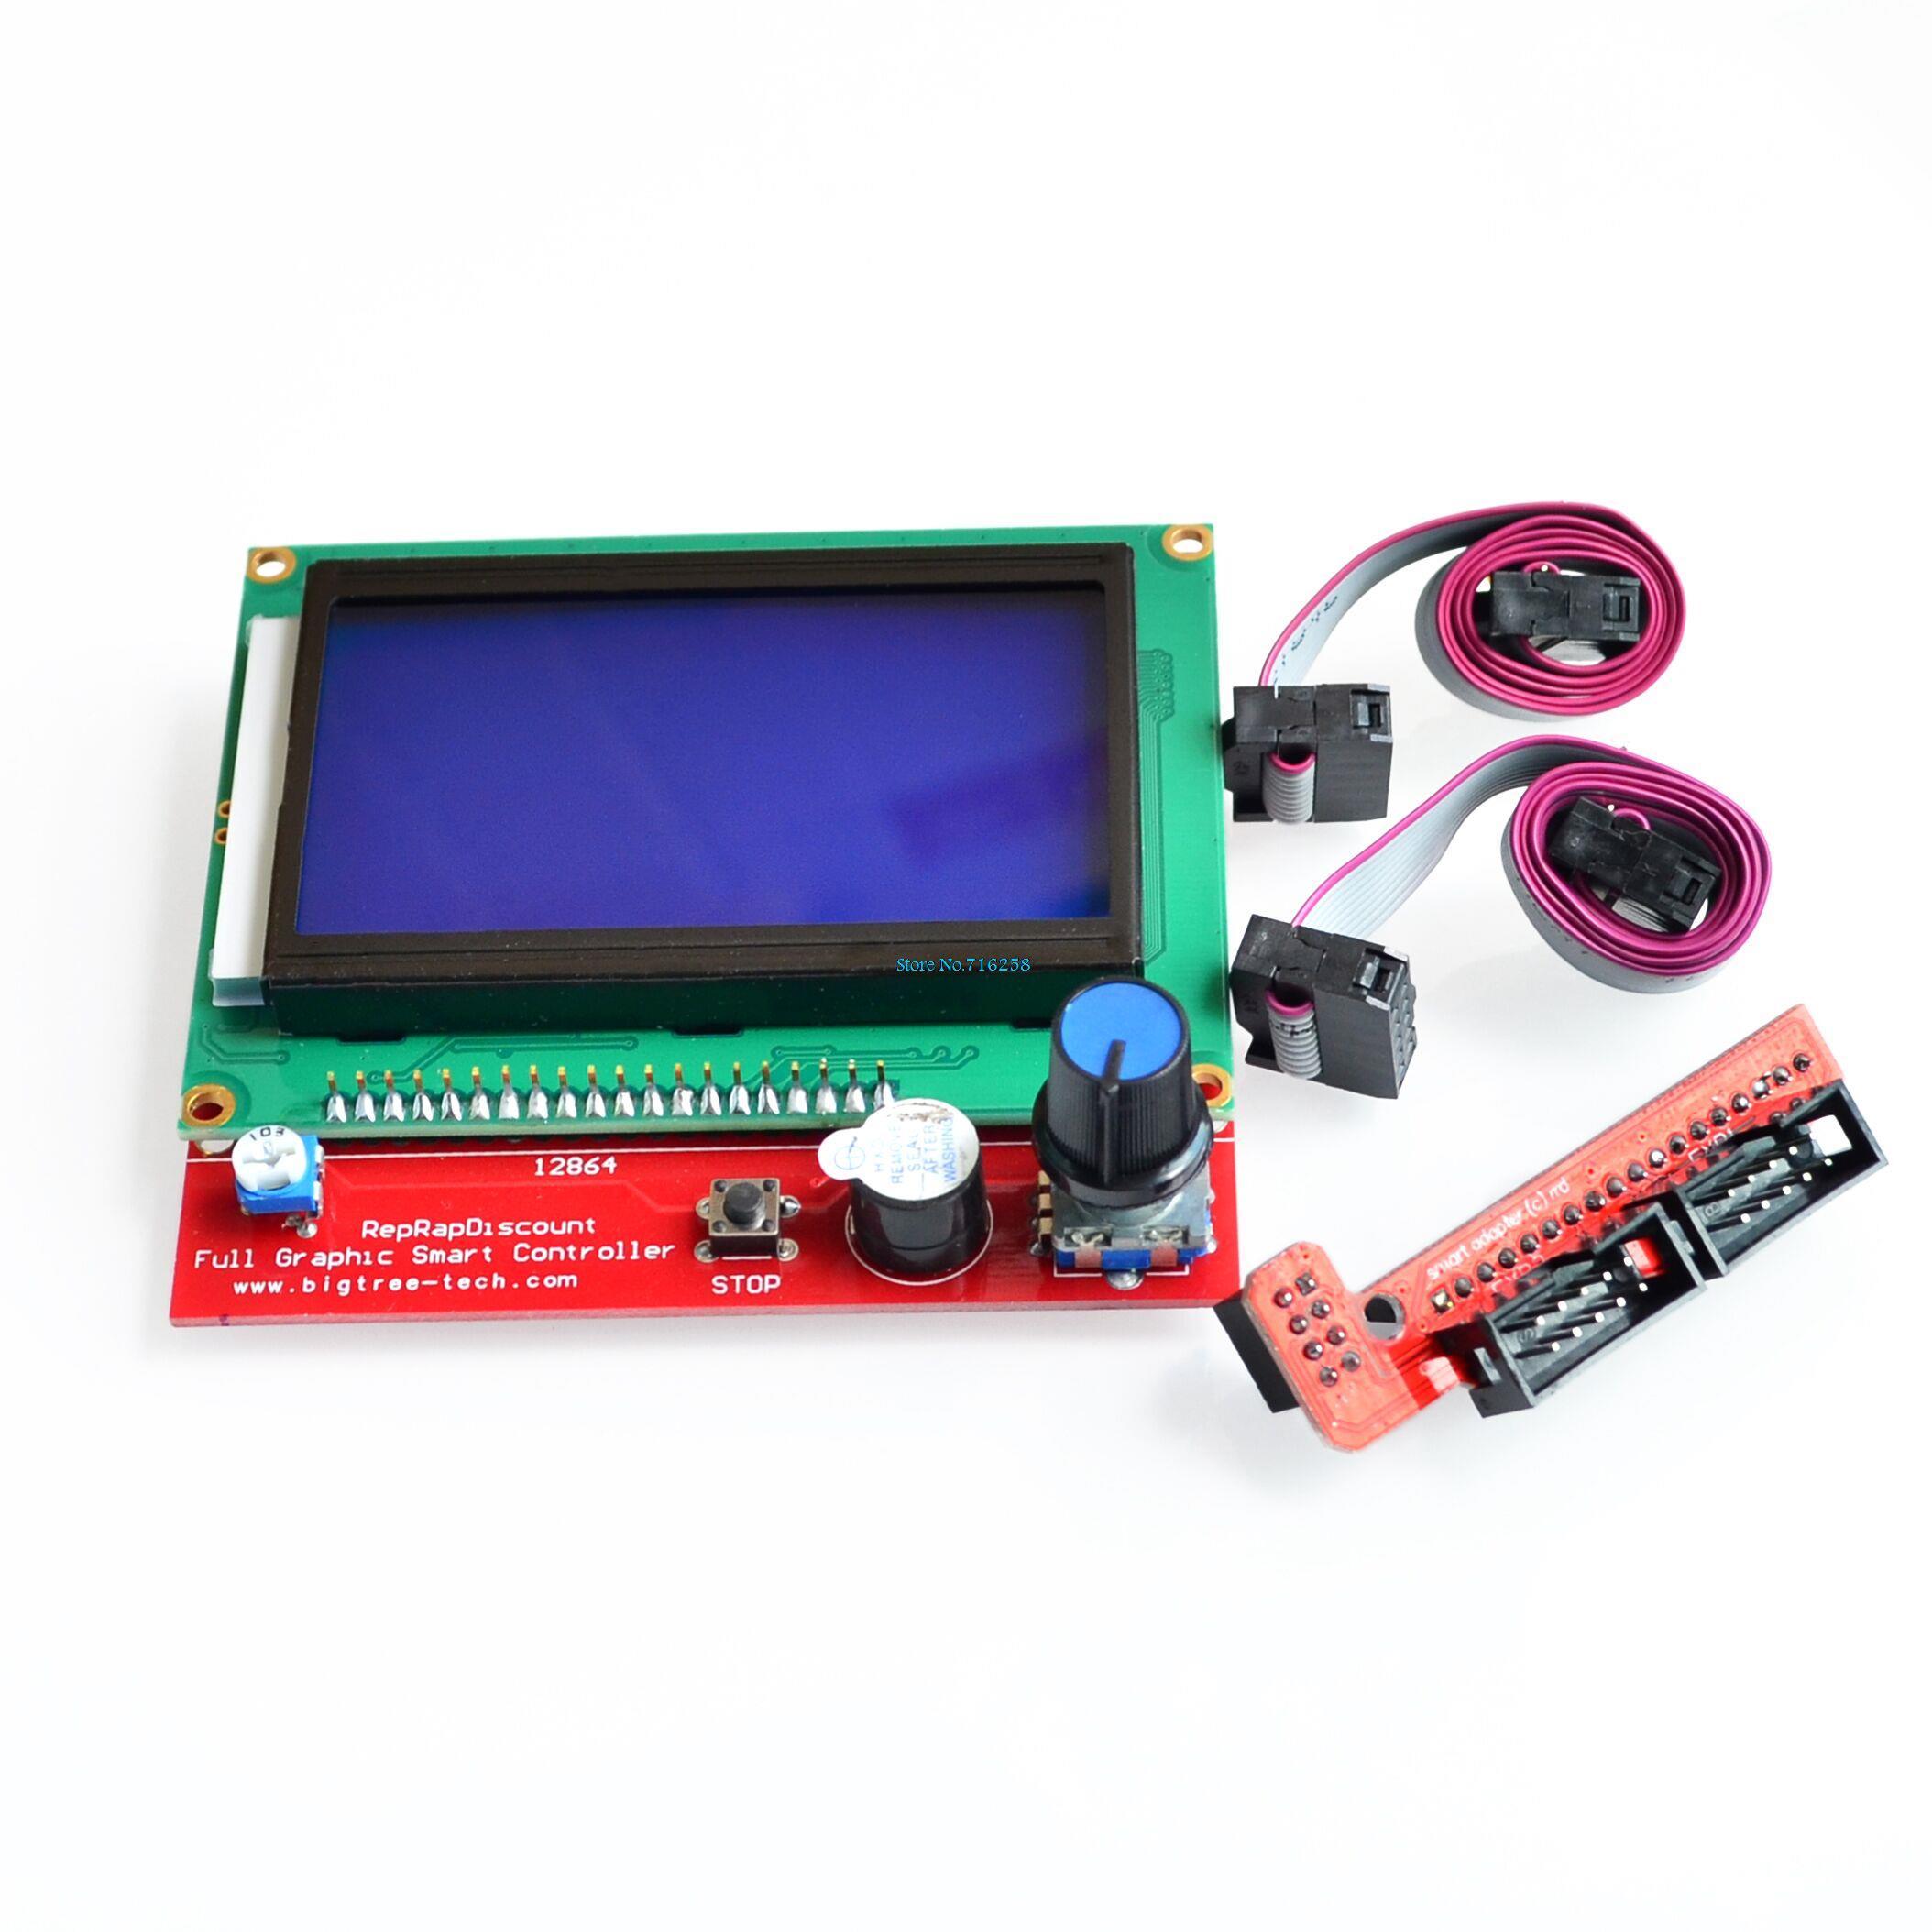 !! 3D printer smart controller RAMPS 1.4 LCD 12864 LCD control panel blue screen!! 3D printer smart controller RAMPS 1.4 LCD 12864 LCD control panel blue screen